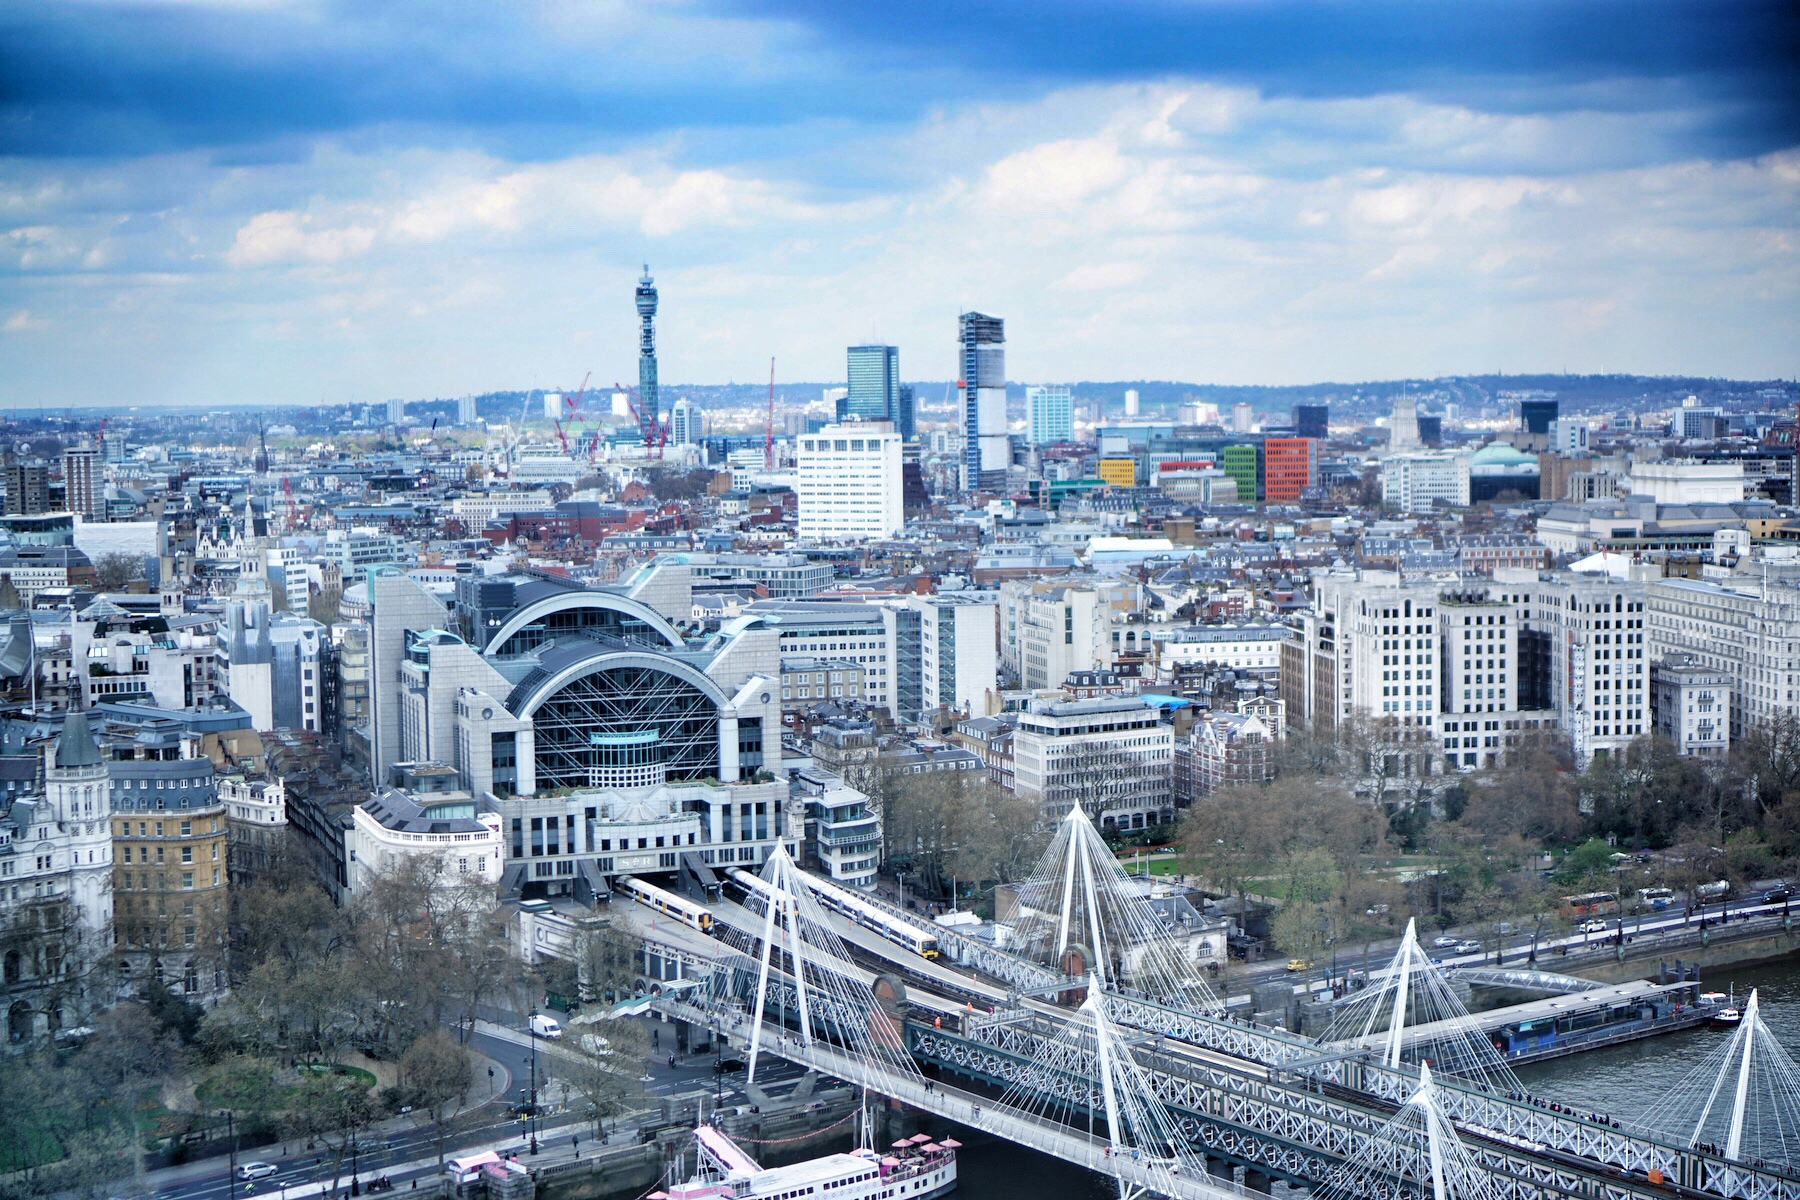 The London Eye - TheFebruaryFox.com